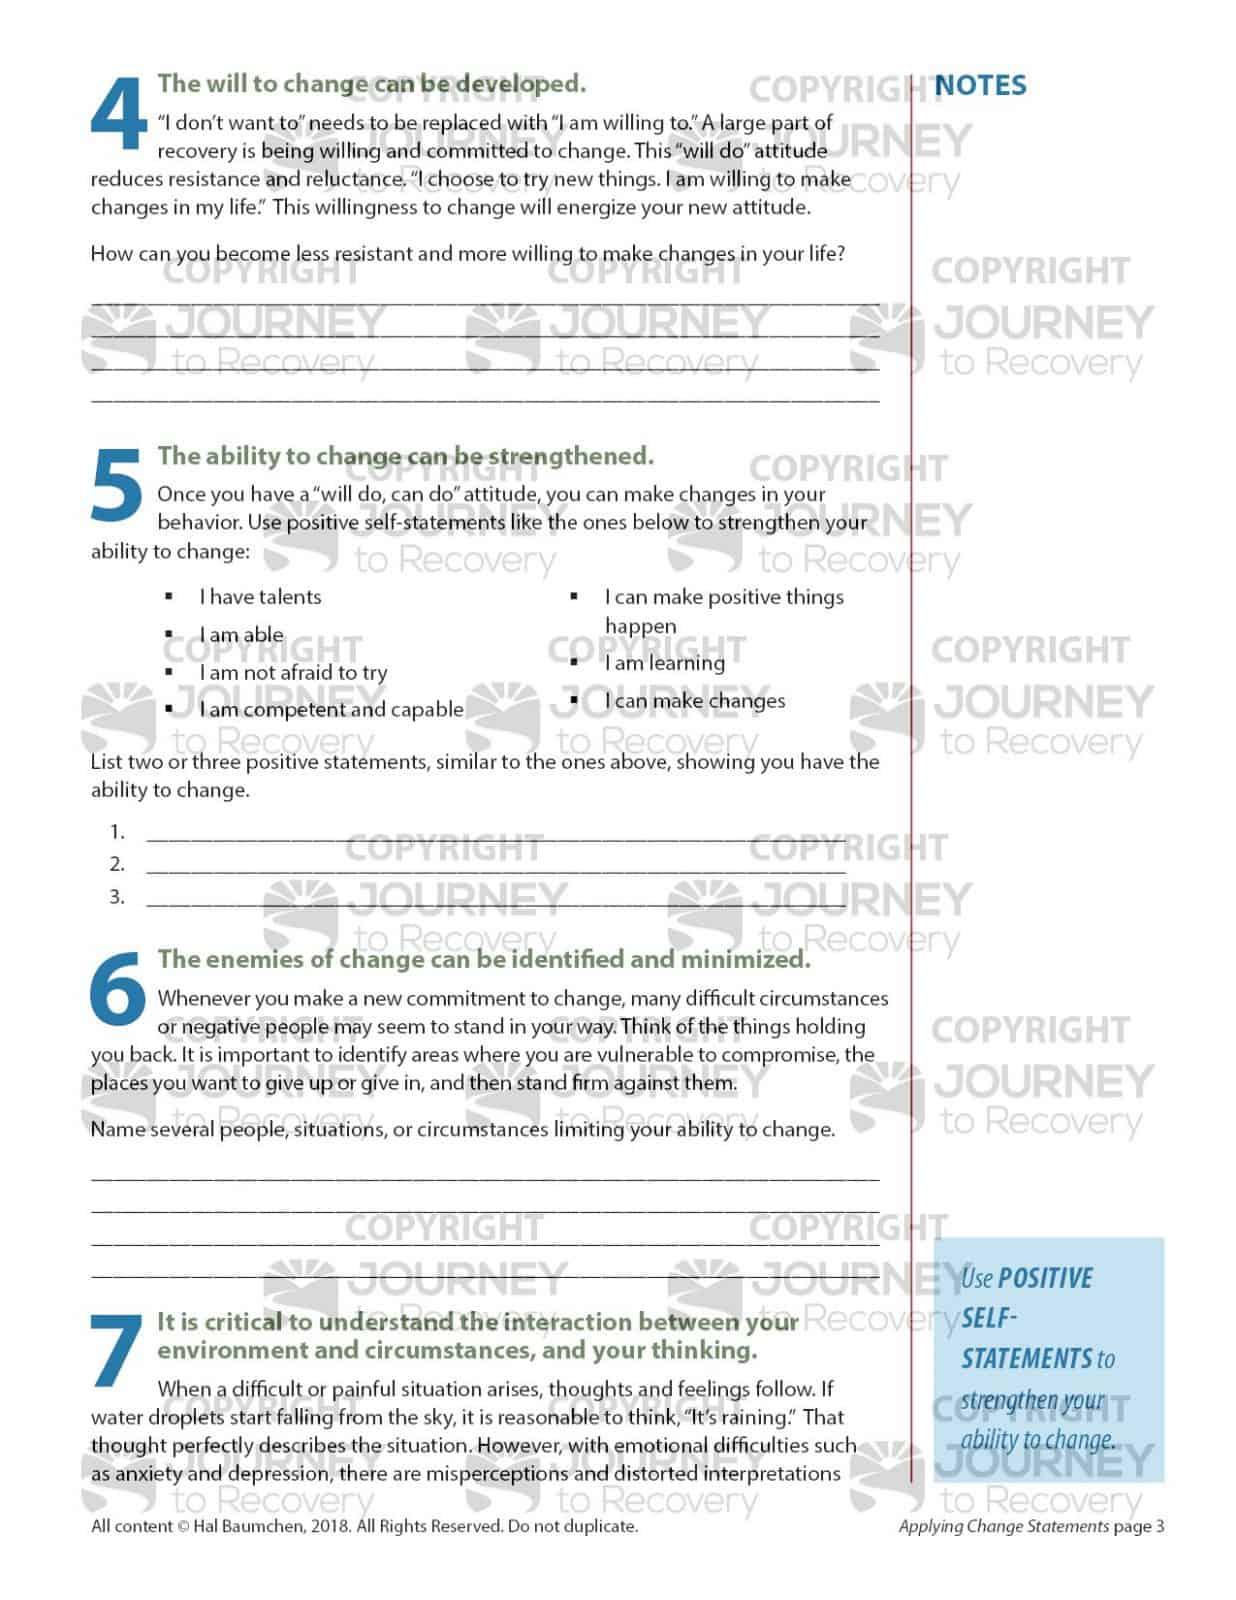 Applying Change Statements Cod Lesson